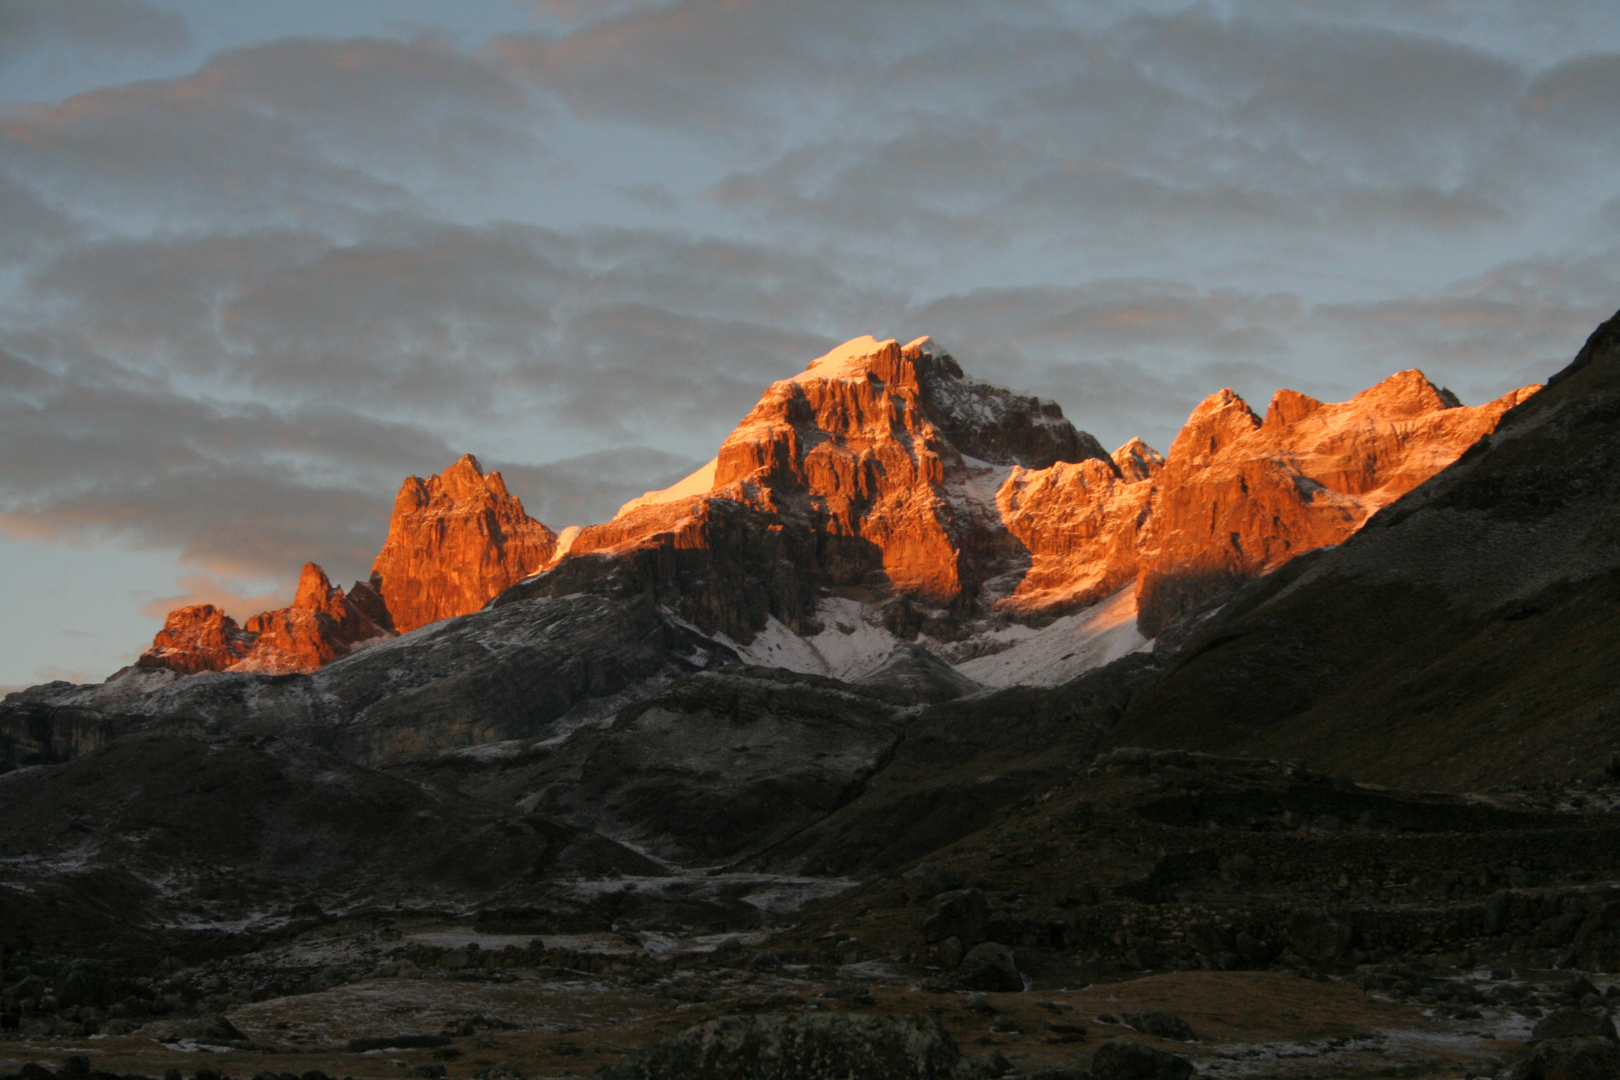 Sonnenaufgang in der Cordillera Huayhuash